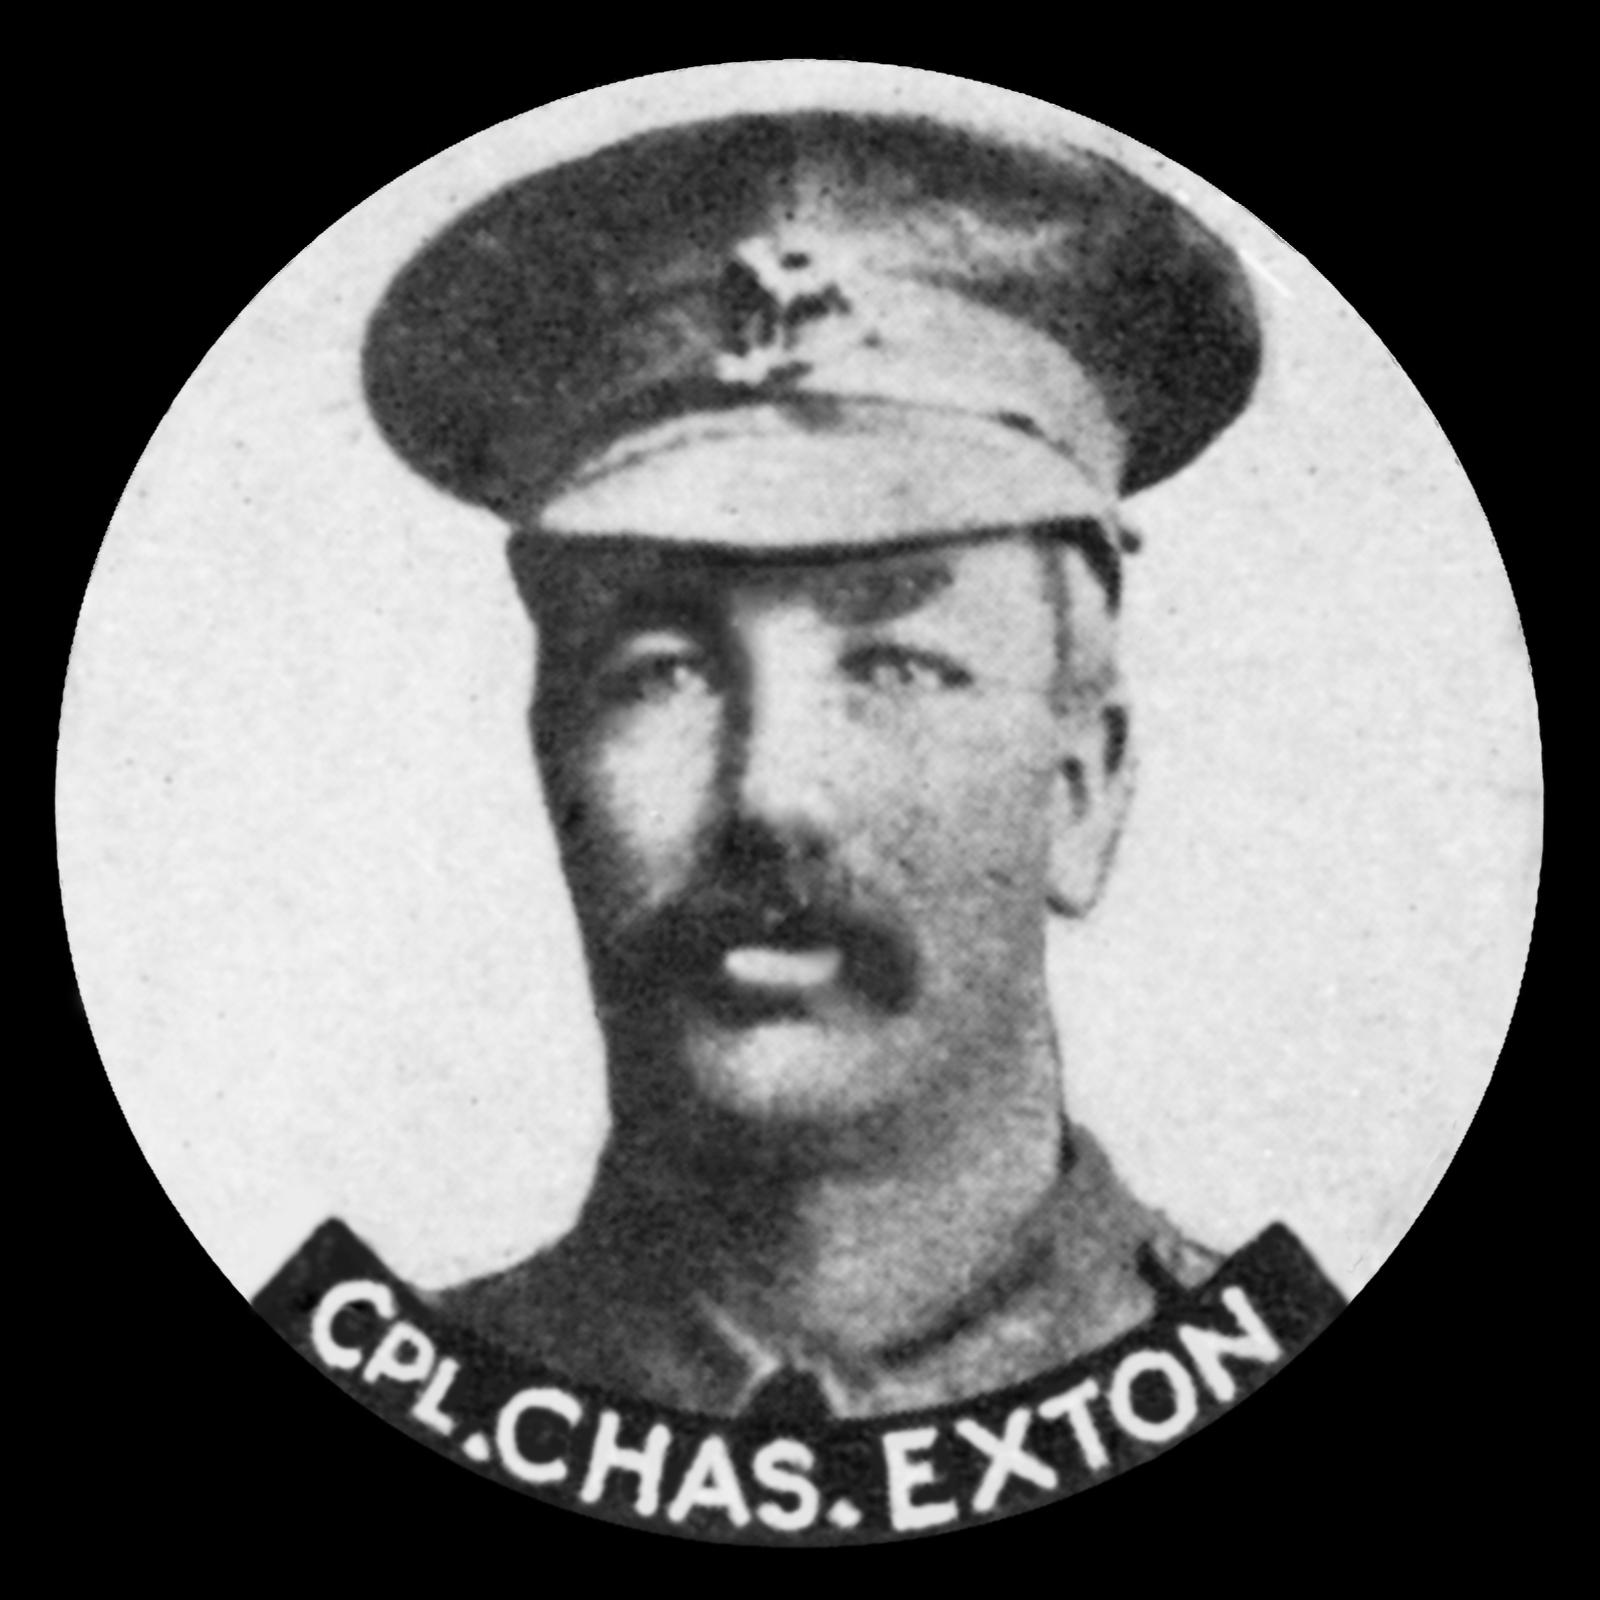 EXTON Charles